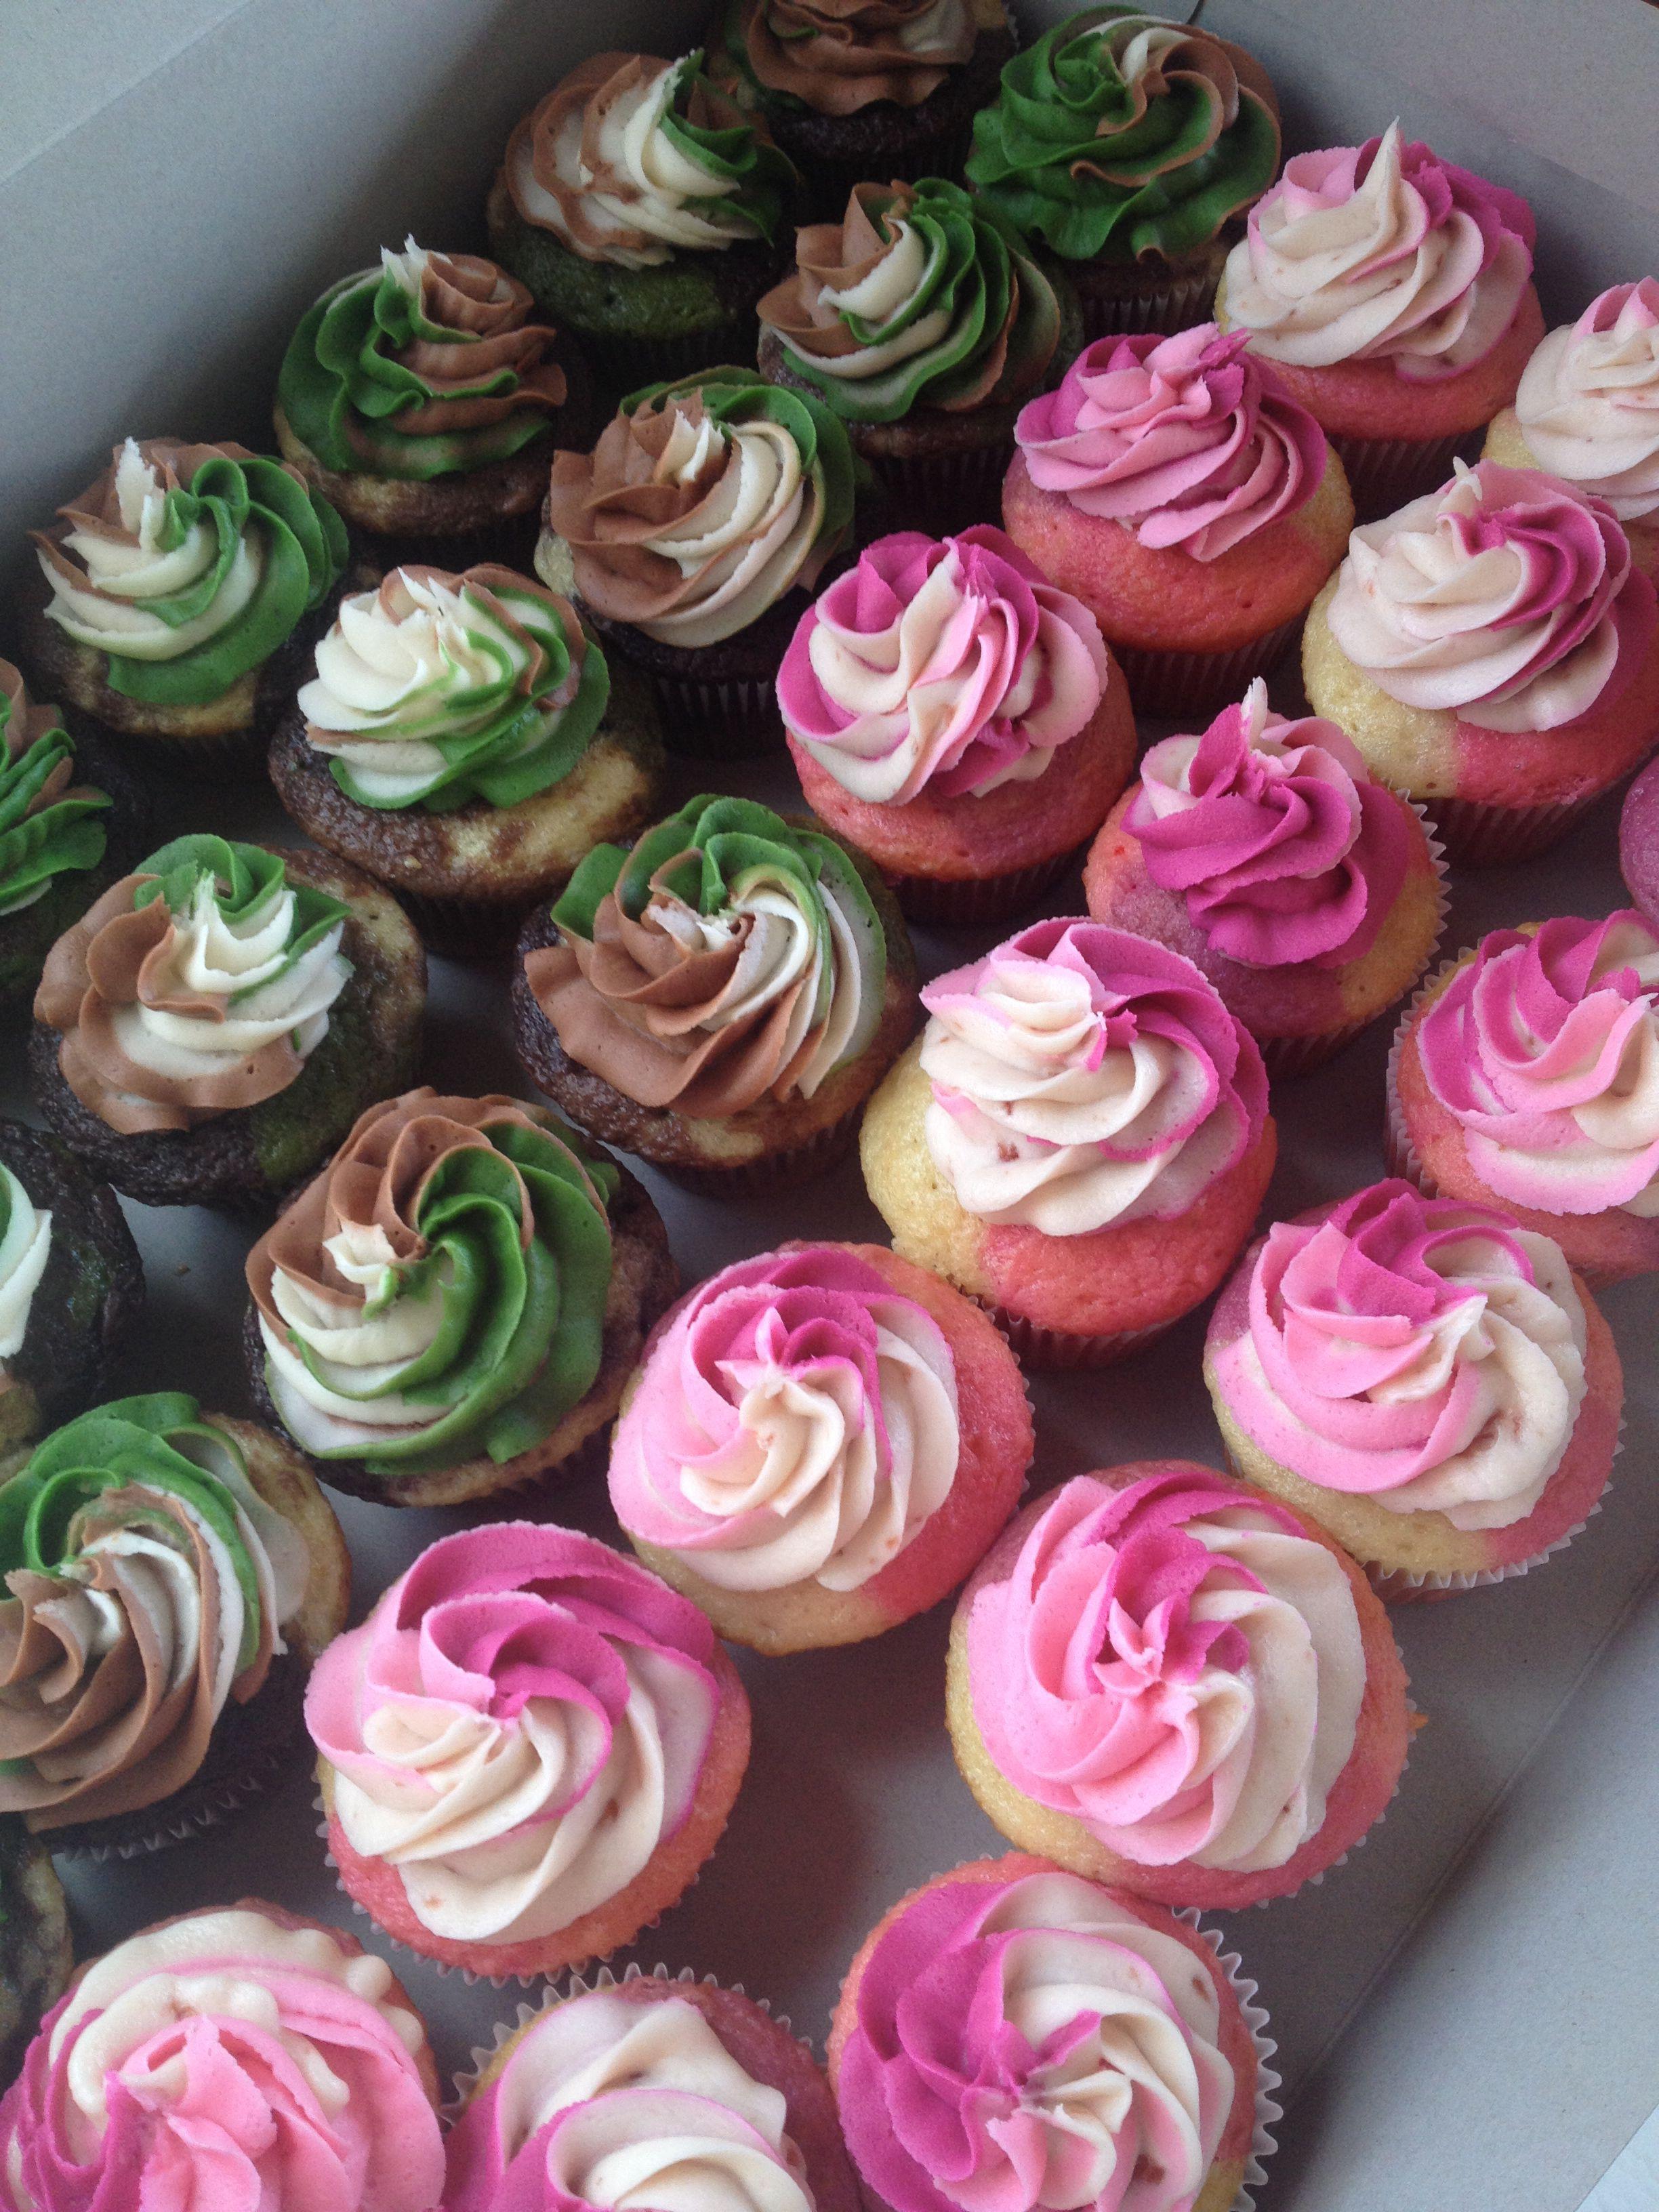 Camouflage cupcakes by StacyCakes WwwfacebookcomStacyCakes1  baby shower  Camo birthday